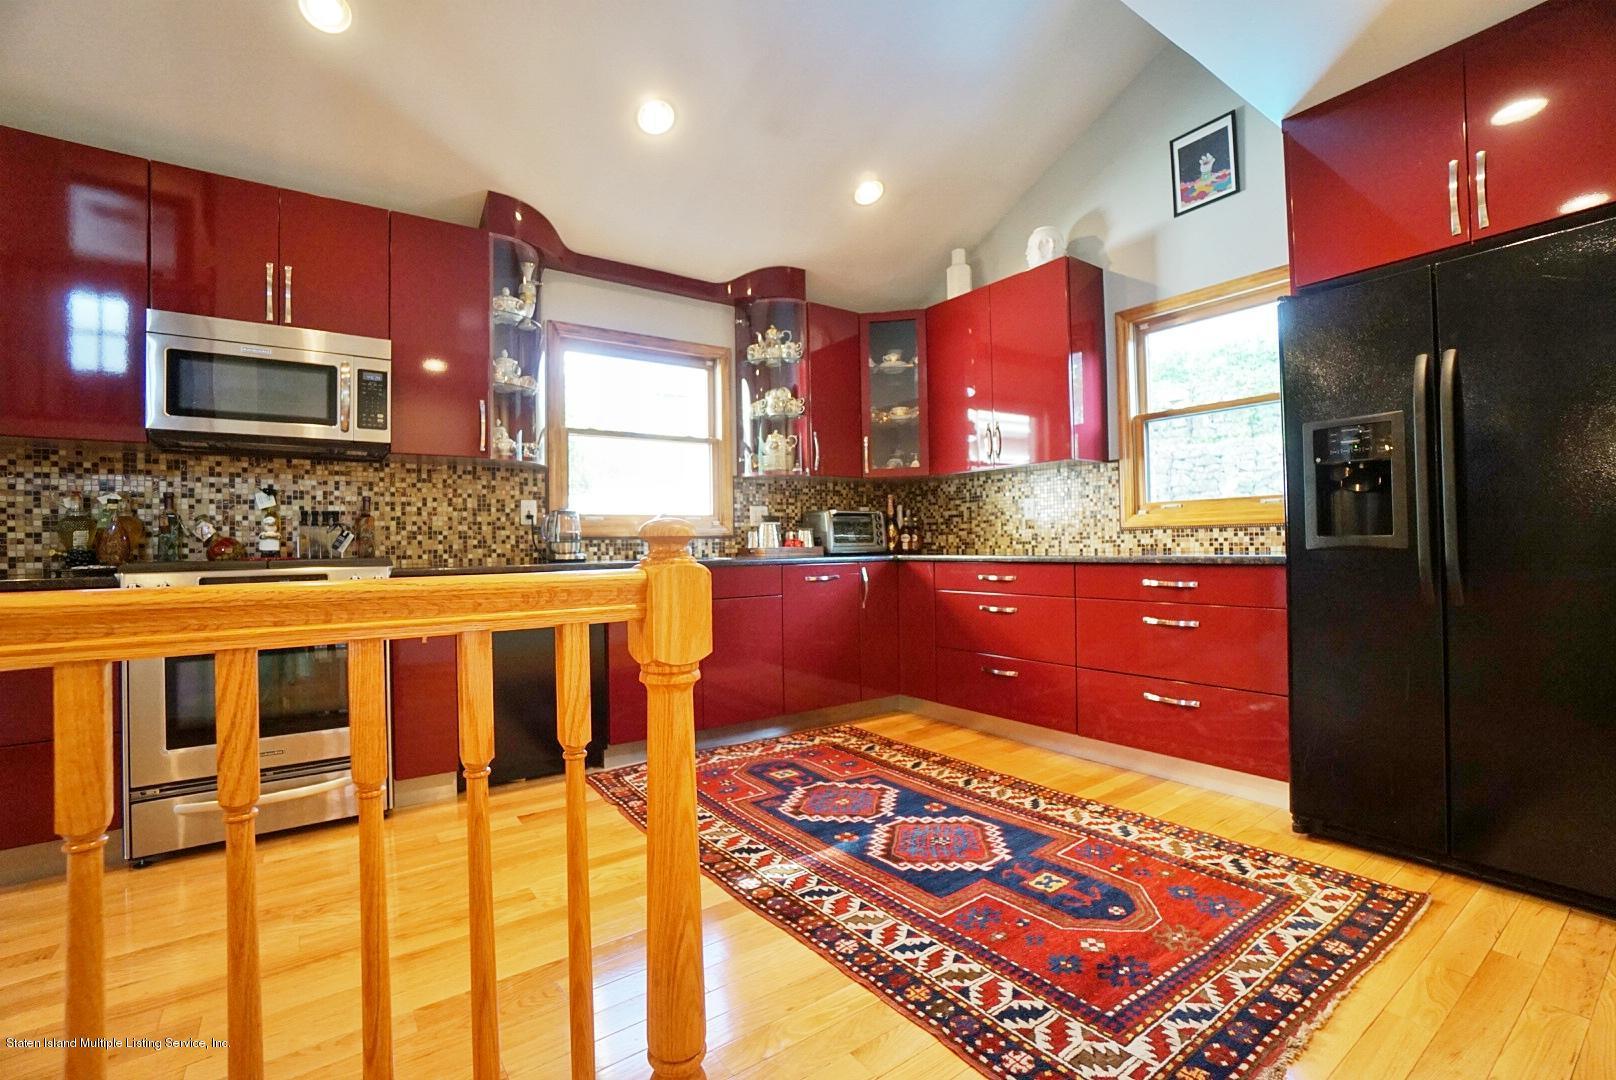 Single Family - Detached 48 Ocean Terrace  Staten Island, NY 10314, MLS-1130826-23